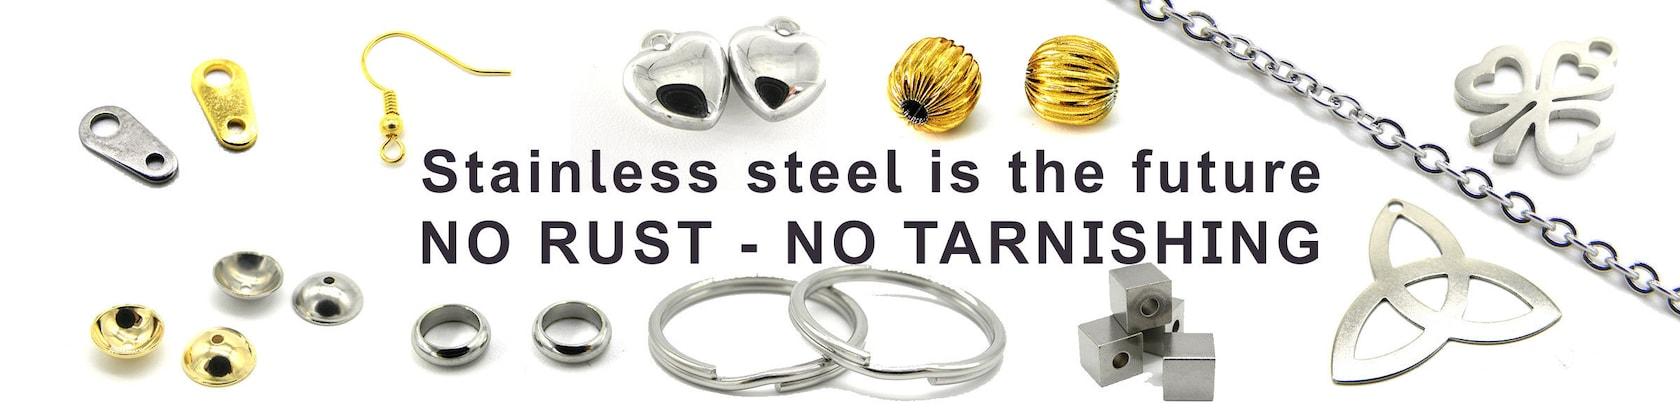 Jewelry Connectors BLACK  Dark Grey Eyepins 150 pc 2 inch Eye Pin